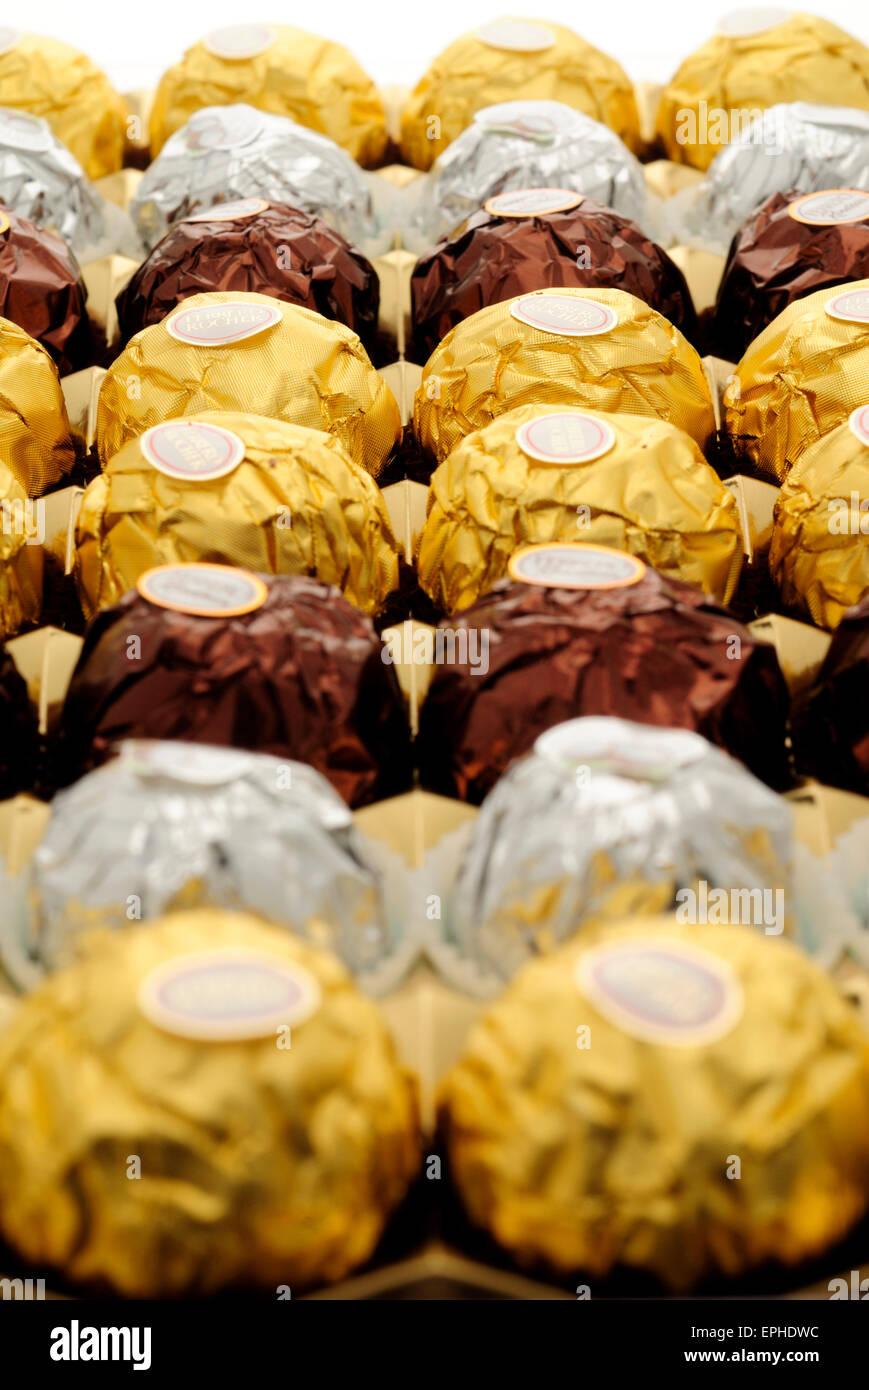 Ferrero Rocher Chocolates Stock Photo, Royalty Free Image ...